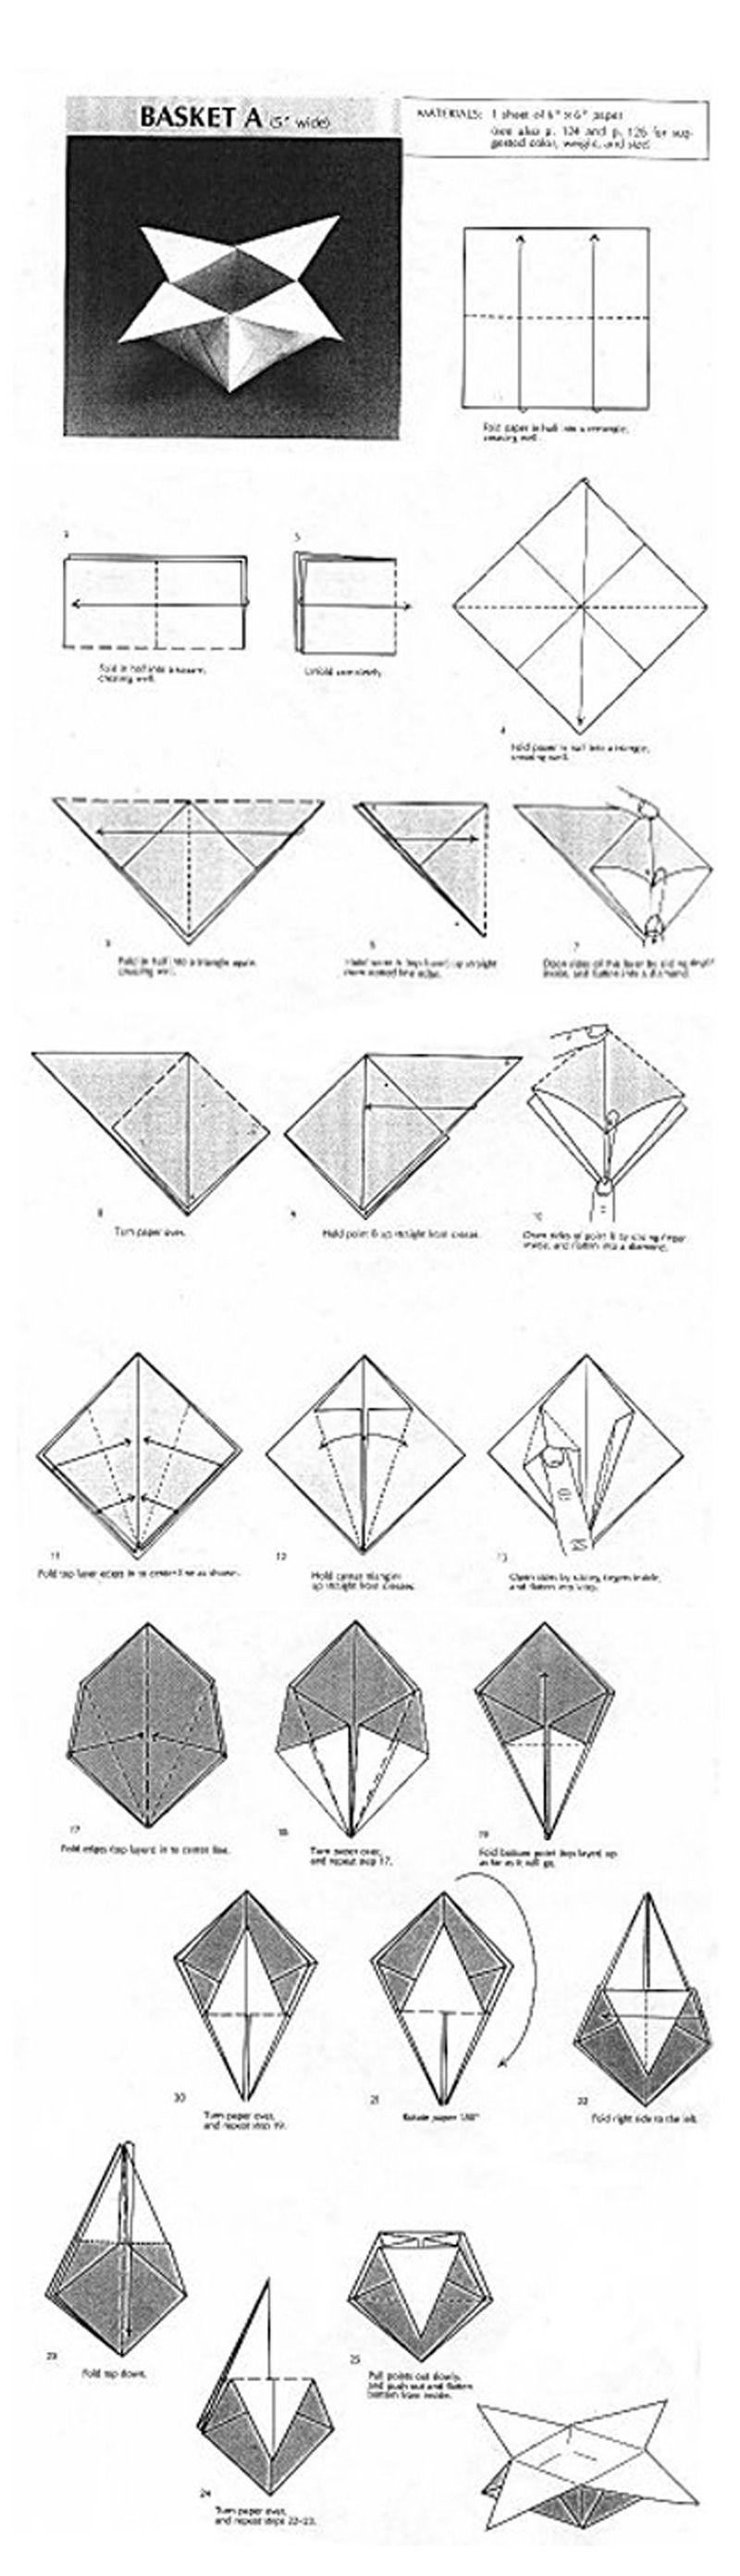 Boite Origami Pour Les Sables De Noel Origami Origami Origami